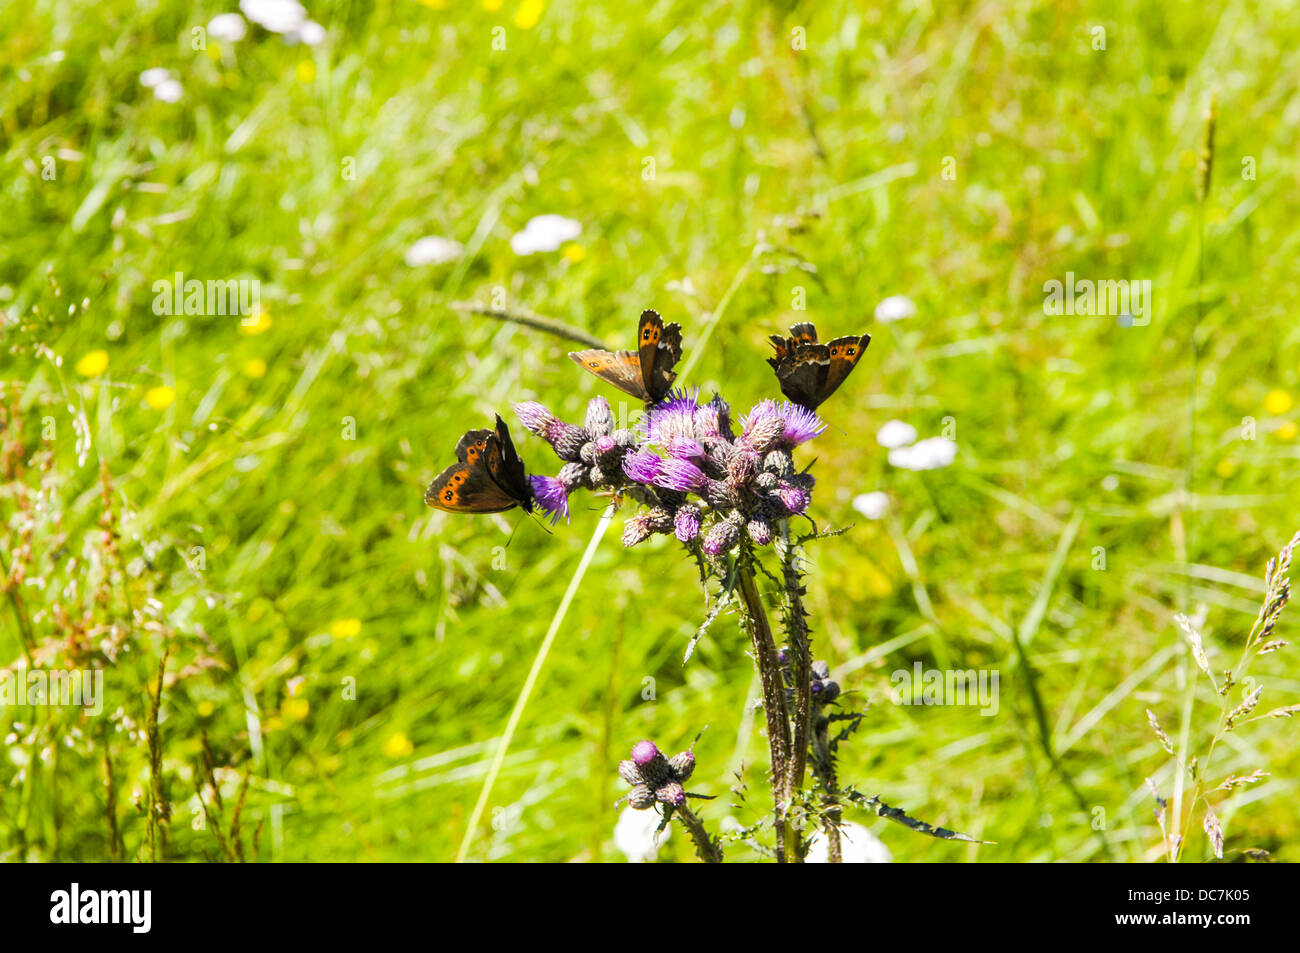 Schmetterlinge auf Distel - Stock Image